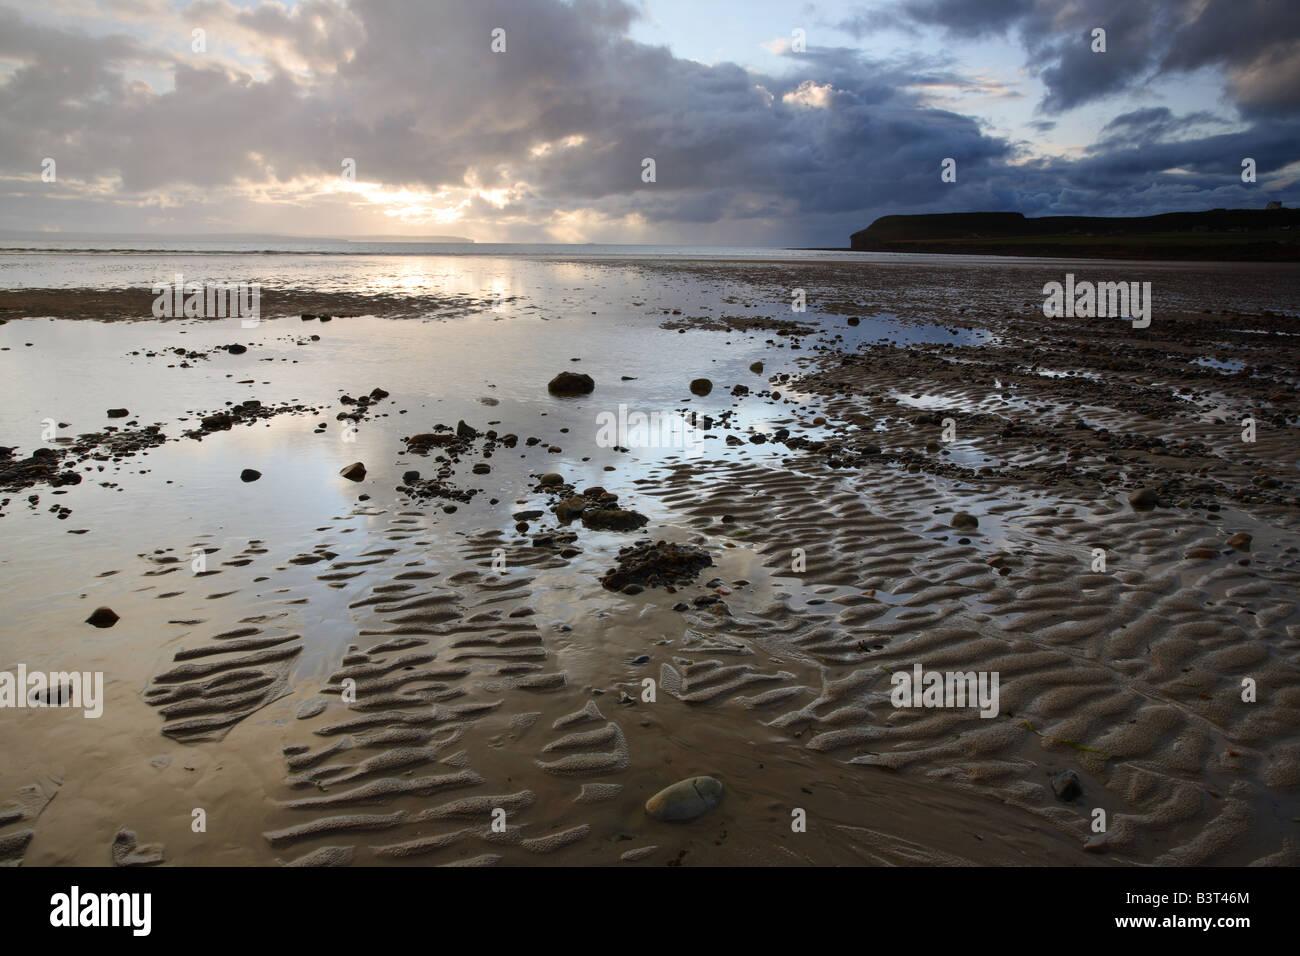 Dunnet Bay from Dunnet near Thurso Caithness Scotland - Stock Image